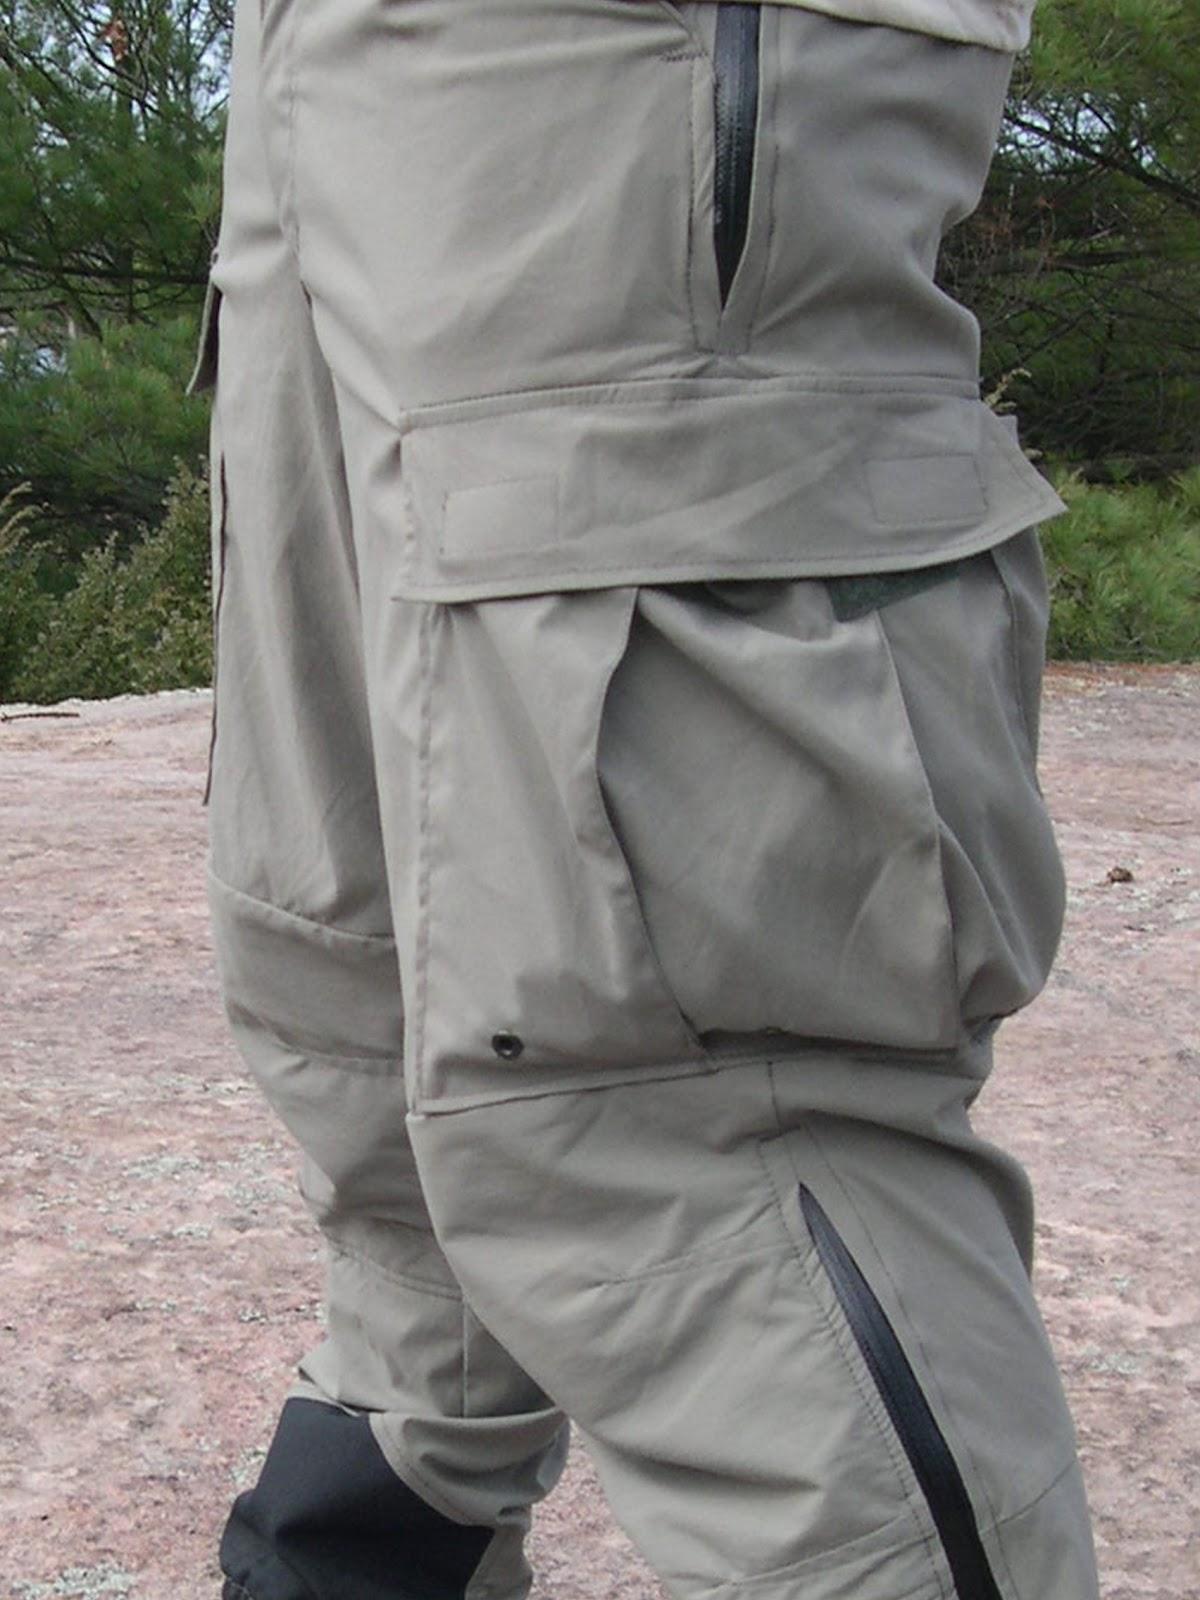 Patagonia Military PCU Level 5 Pants Gen-II Size Medium Regular READ